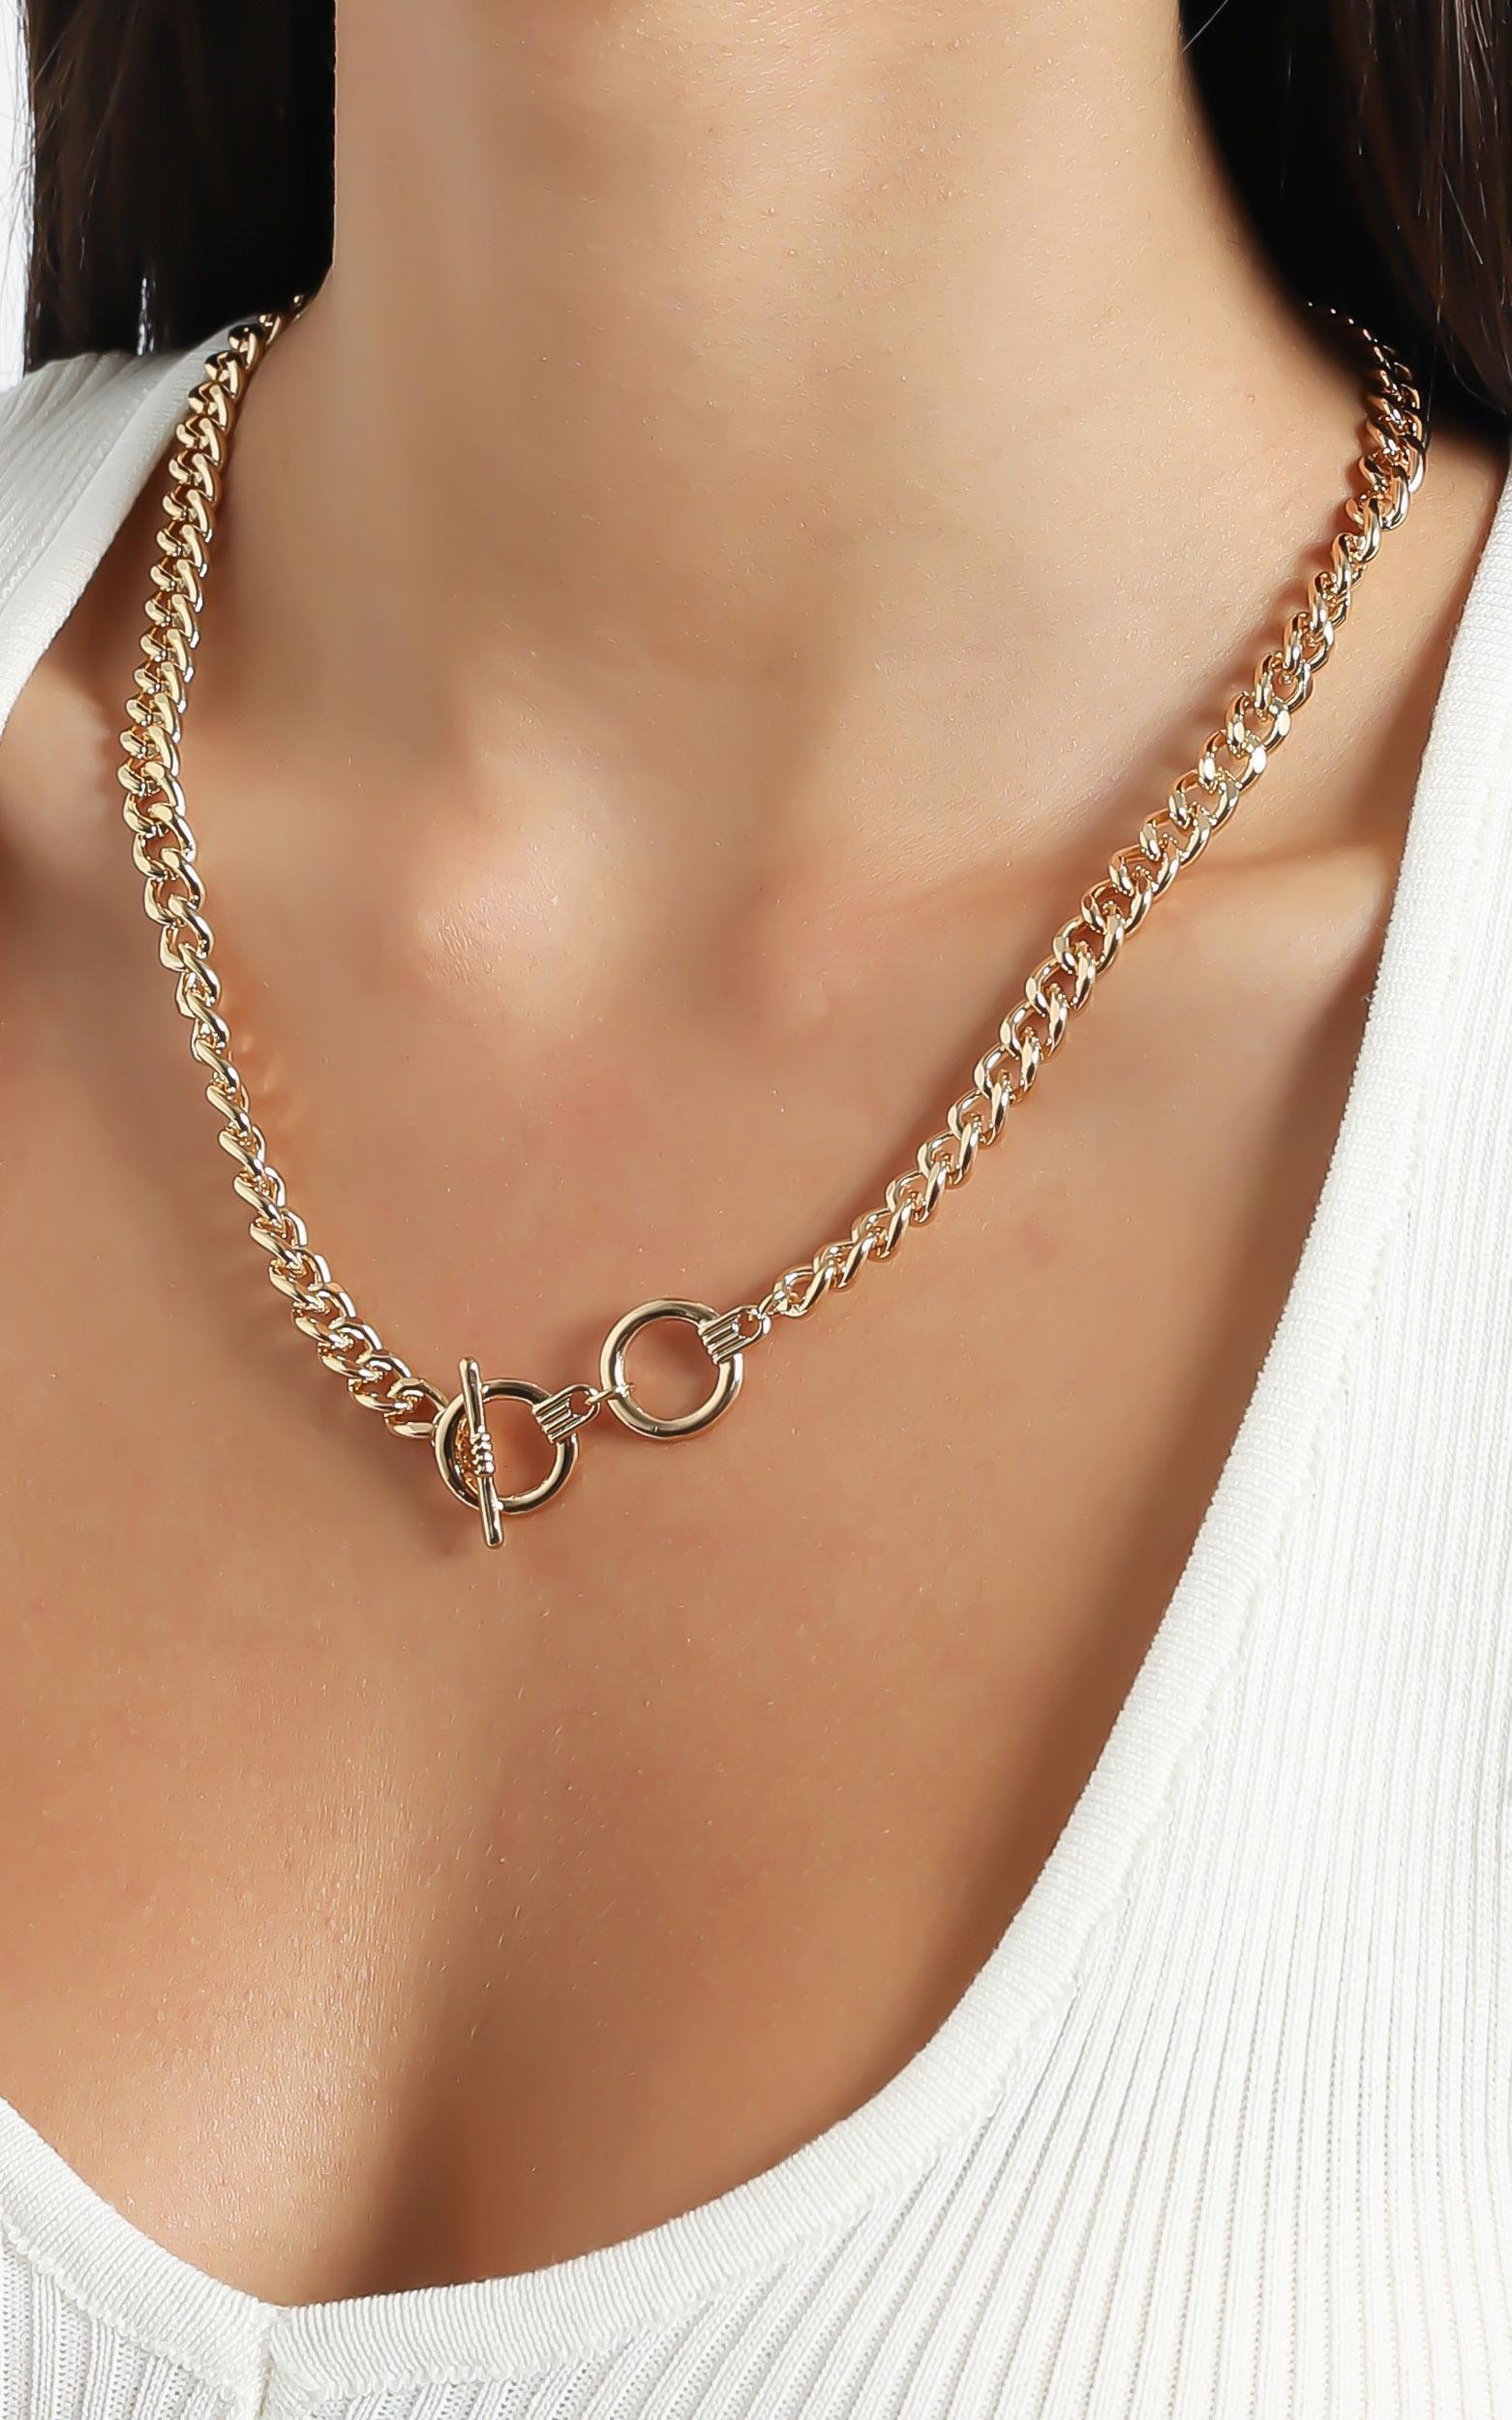 Reliquia - Portovenere Necklace in Gold, , hi-res image number null